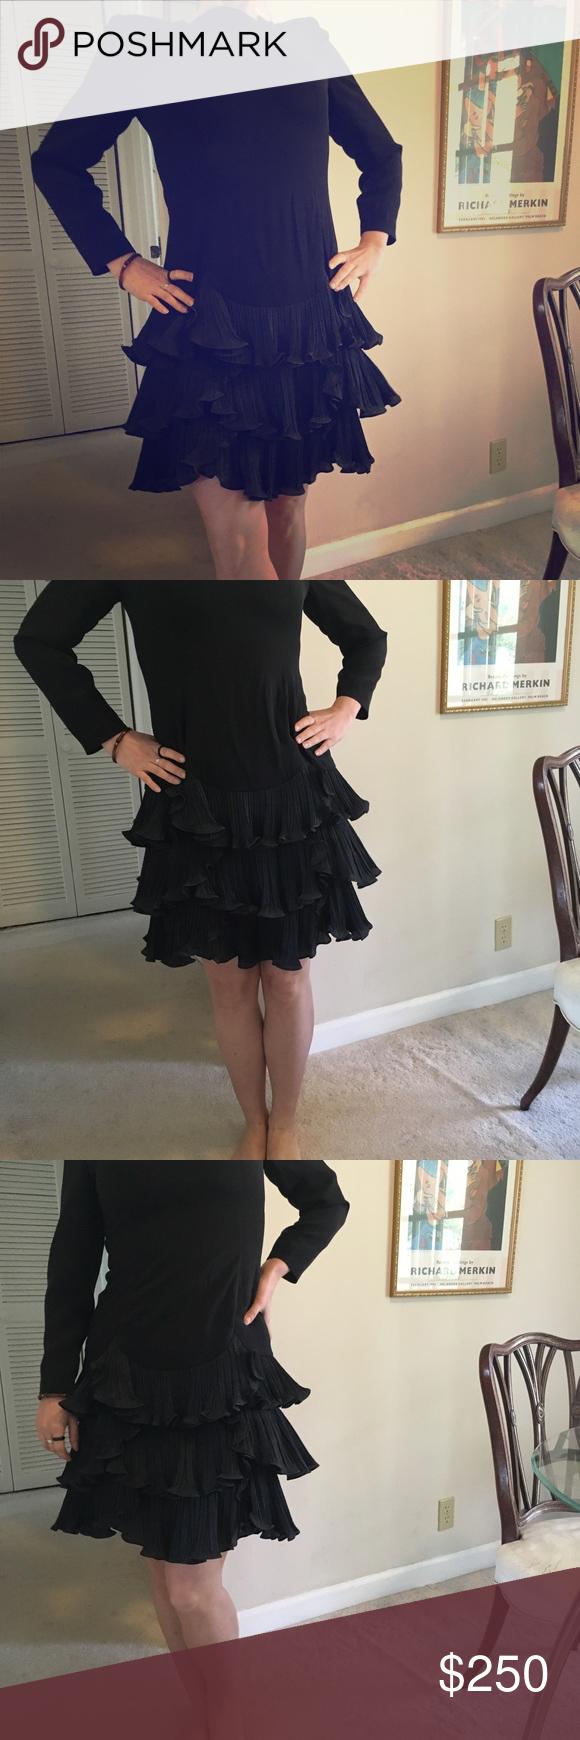 Carolina Herrera Vintage Black Dress Vintage Black Dress Carolina Herrera Dresses Clothes Design [ 1740 x 580 Pixel ]